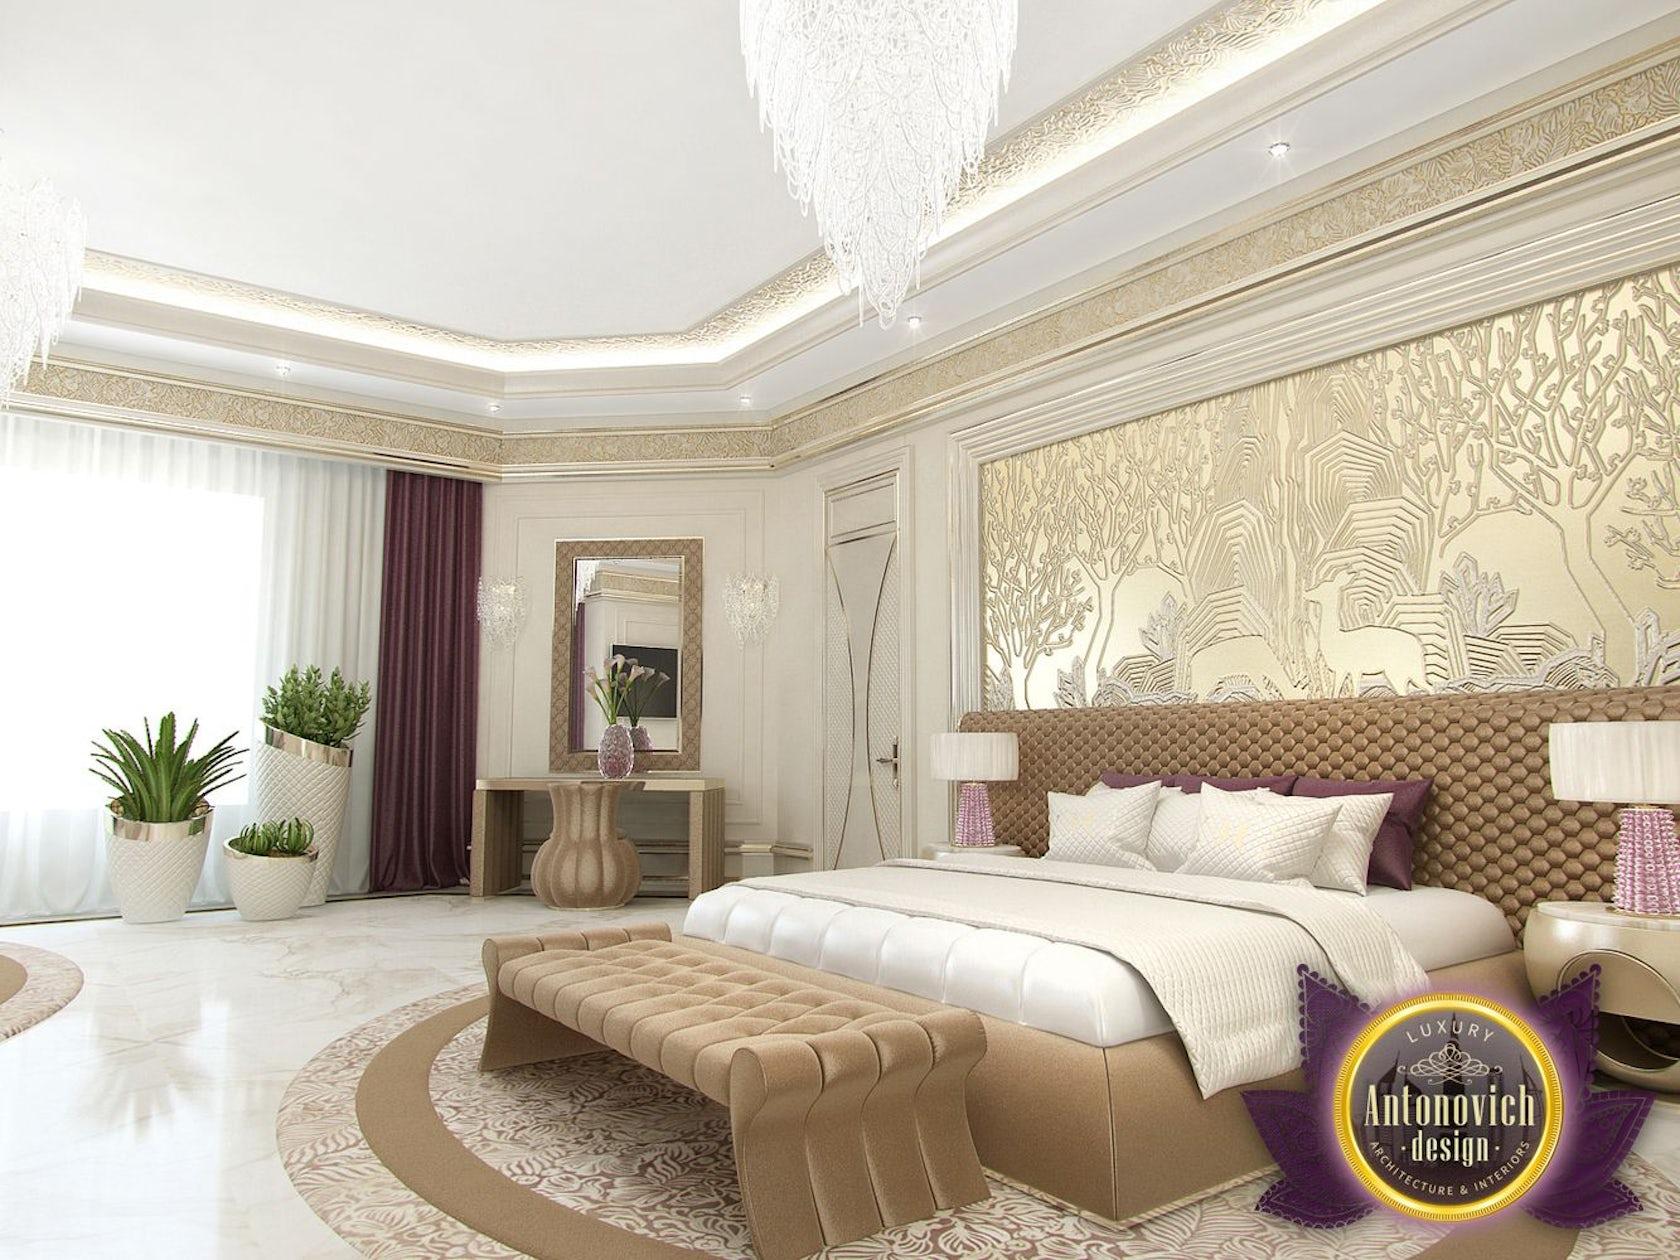 Modern bedroom designs by luxury antonovich design for Luxury bedrooms instagram